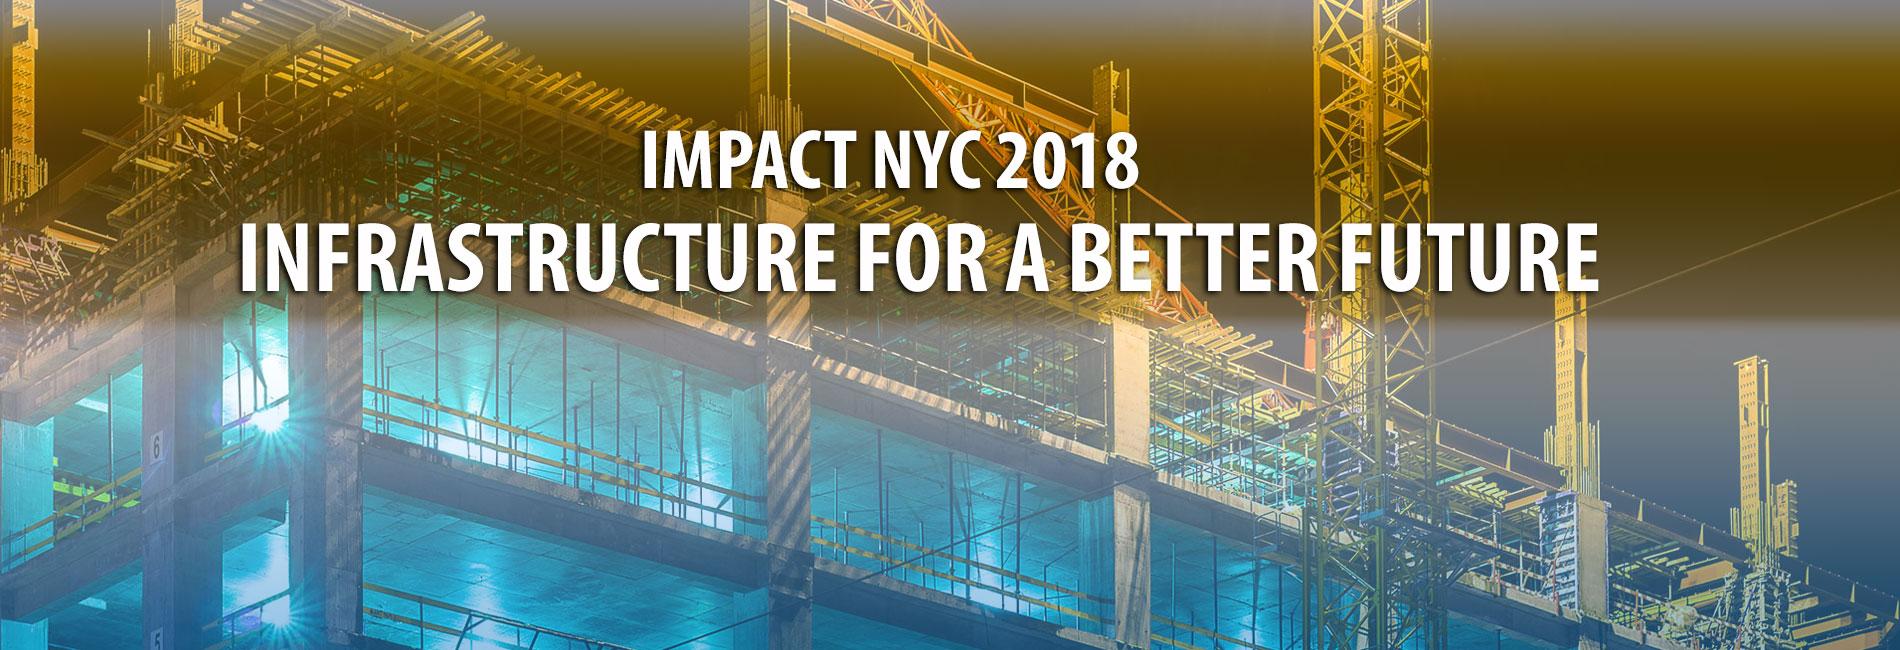 Impact NYC